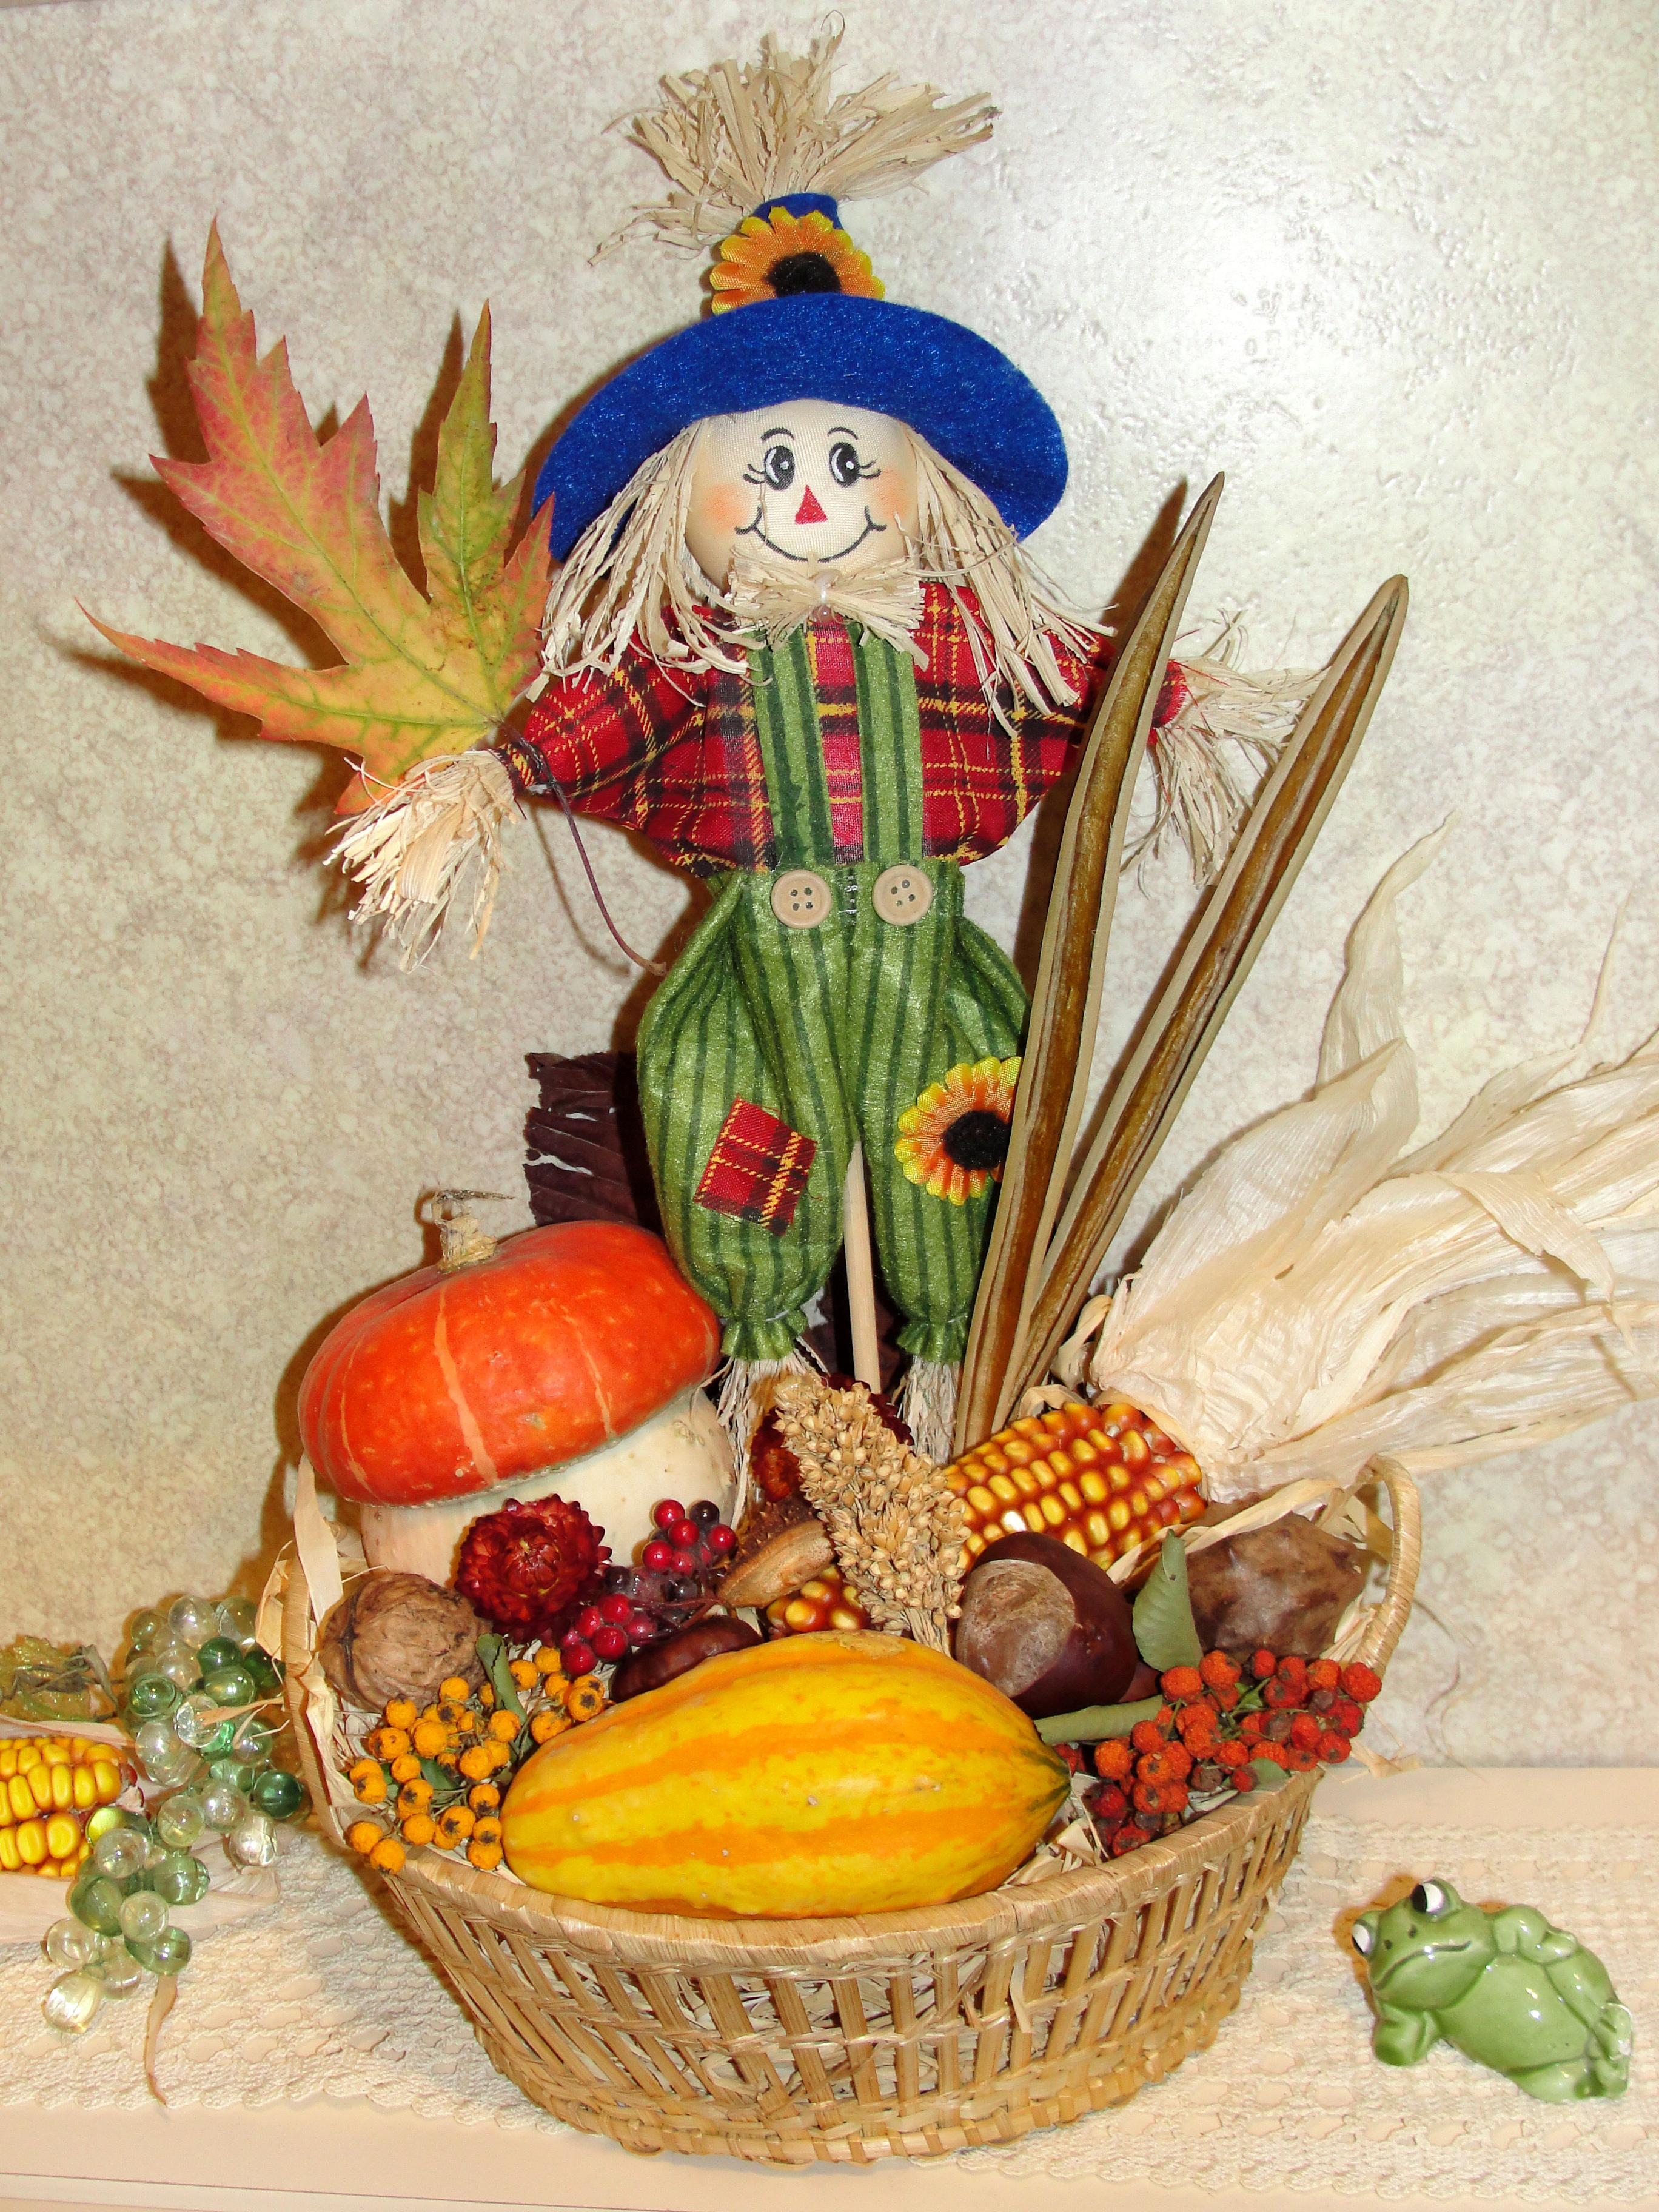 Kostenlose foto : Herbst, Gemüse, Cucurbita, Lebensmittel ...